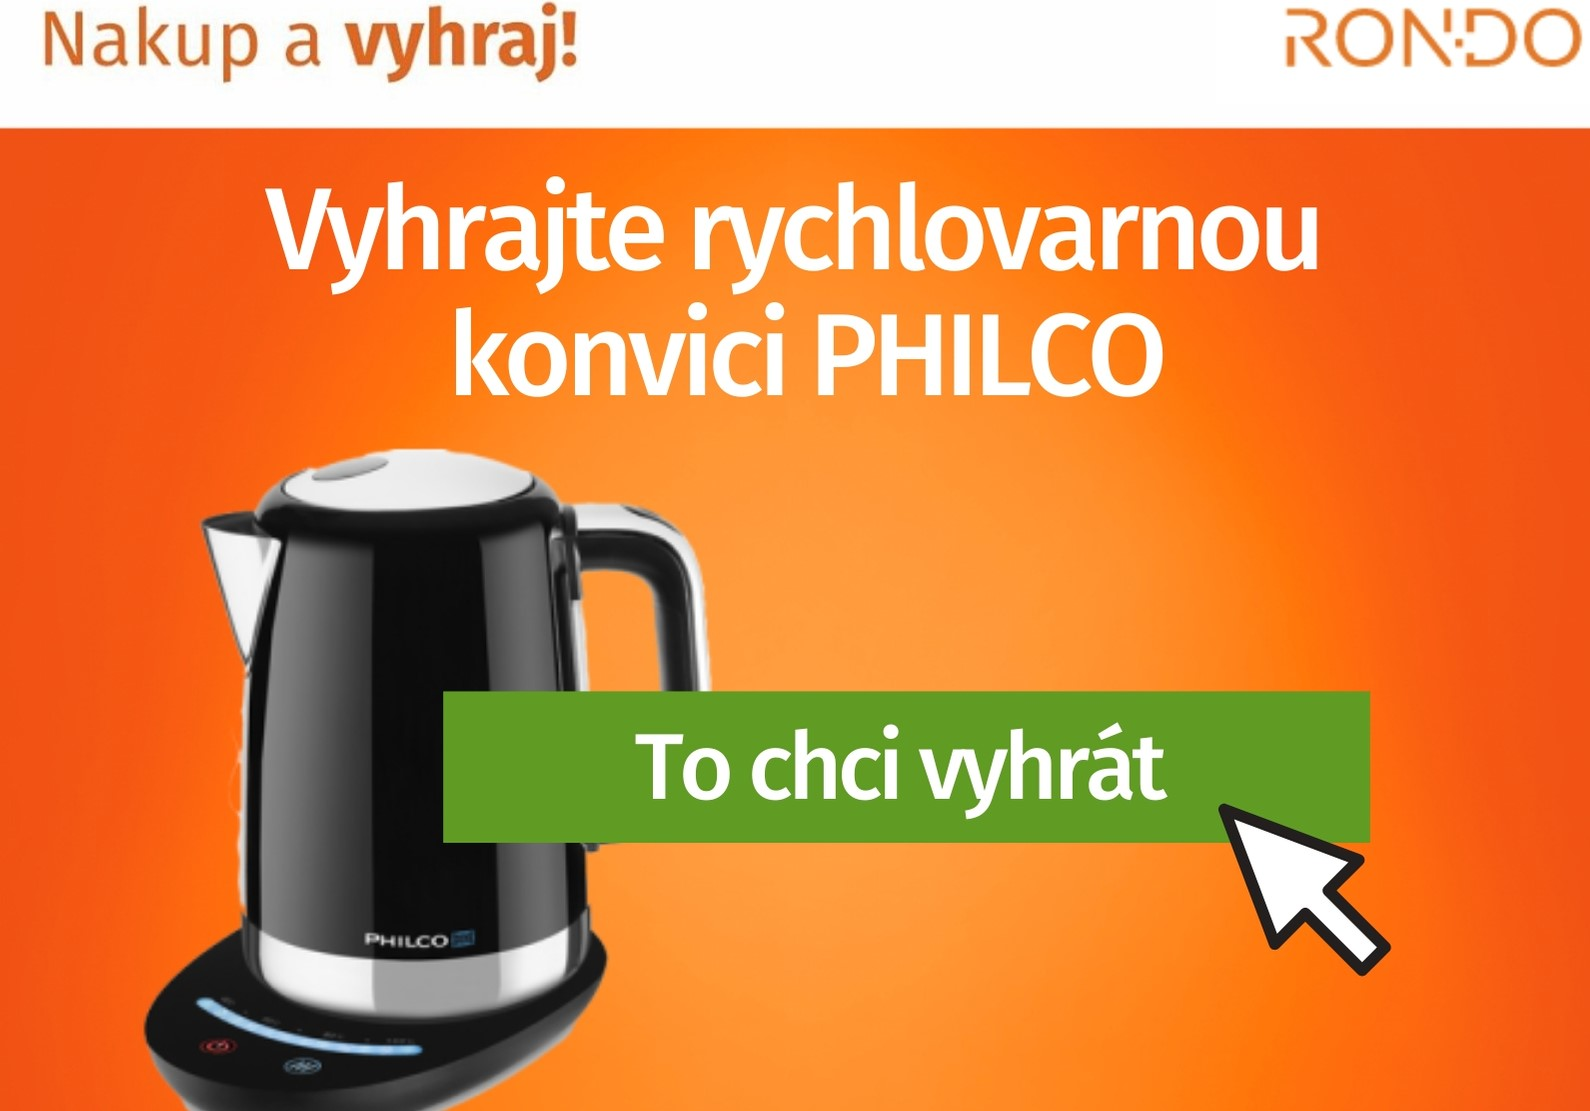 Soutěž o rychlovarnou konvici Philco - www.rondo.cz